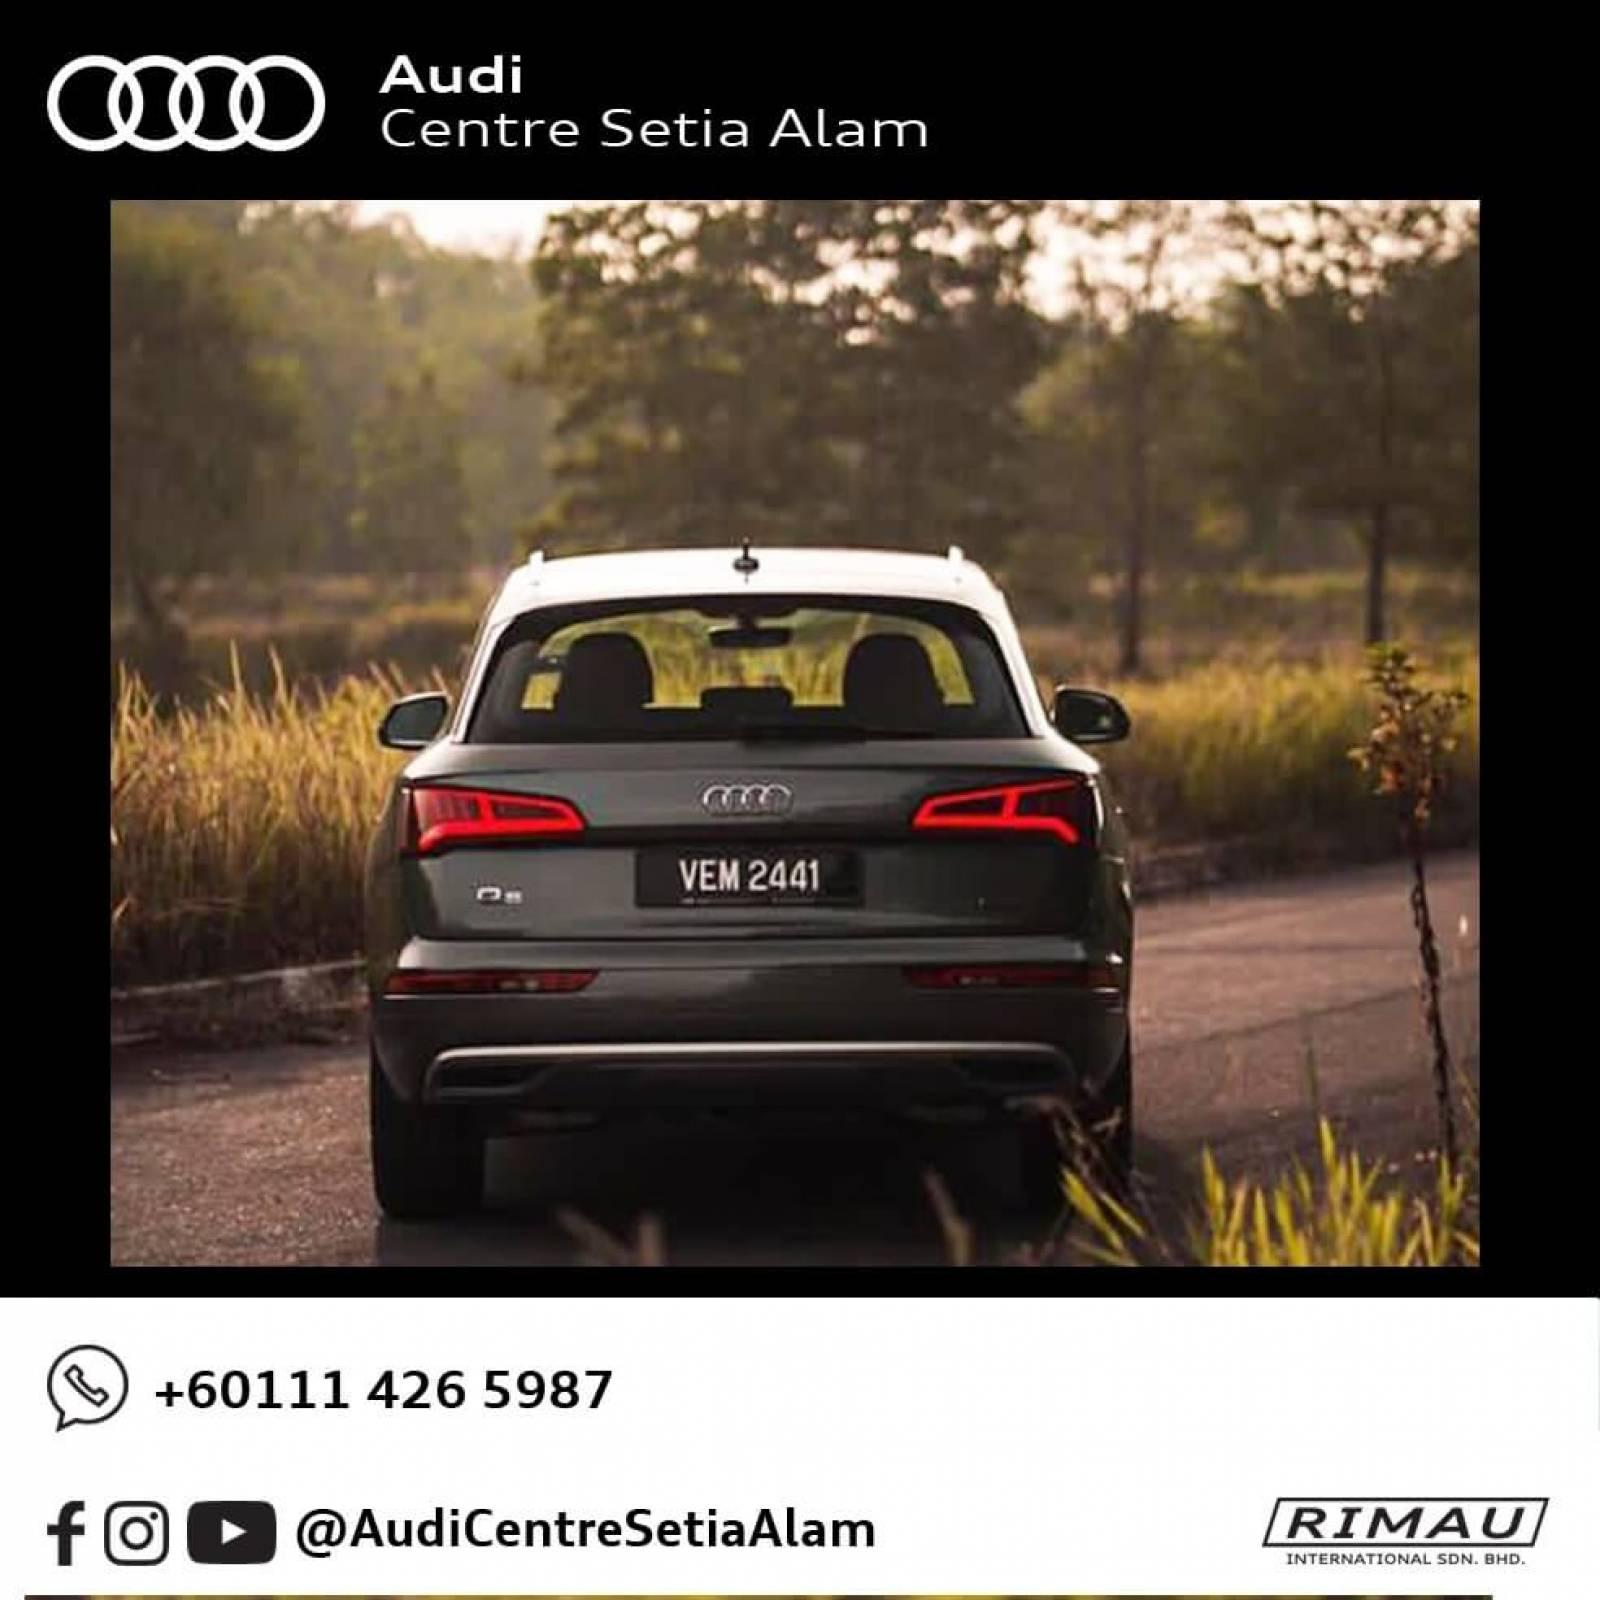 2020 Audi Q5 2.0 TFSI quattro - Demo